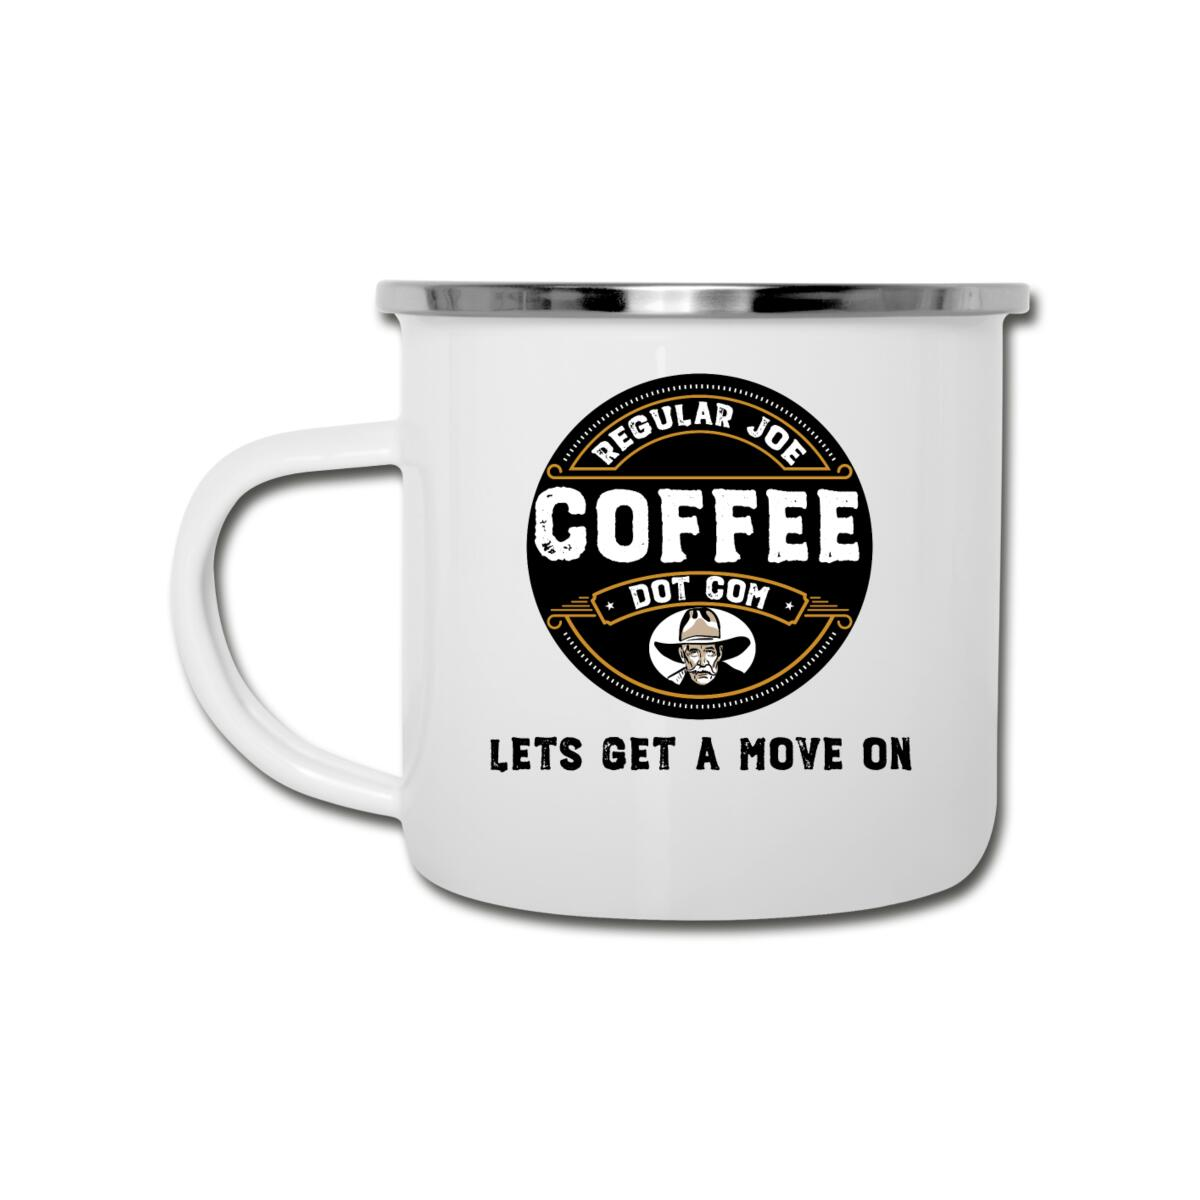 Lets Get a Move On Mug